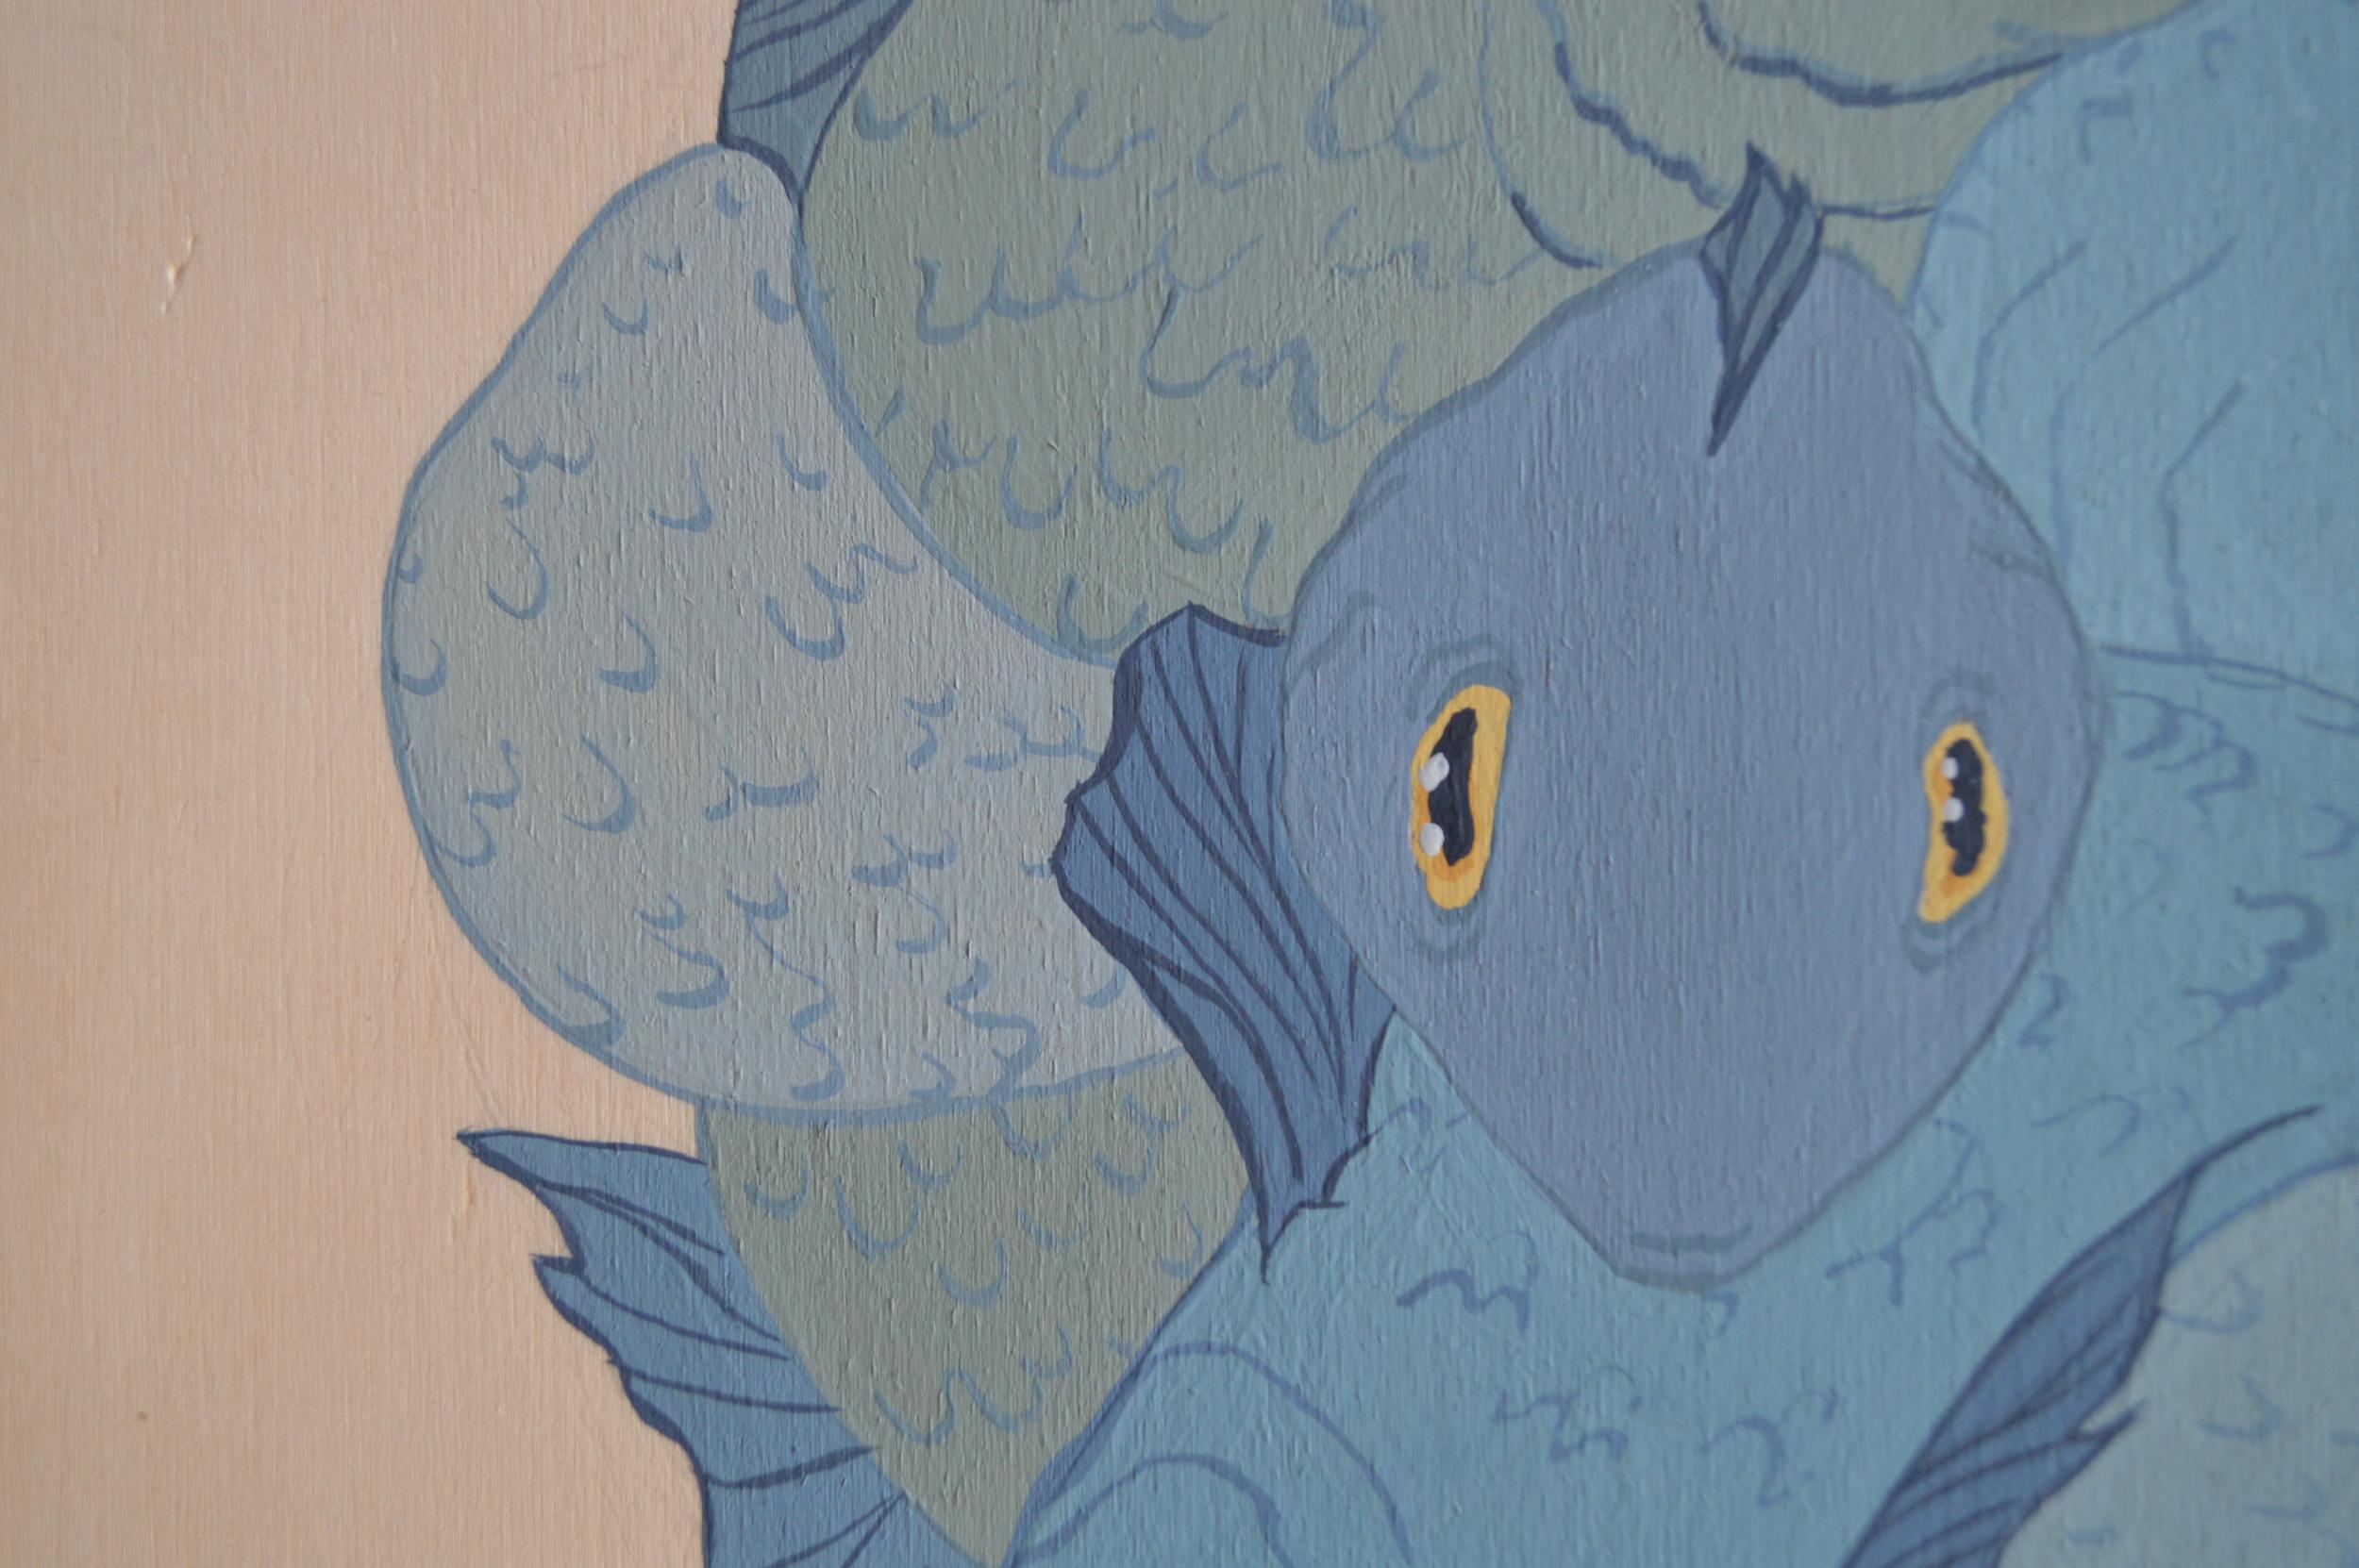 Fish (detail),30 x 30 cm, gouache on wood, 2013